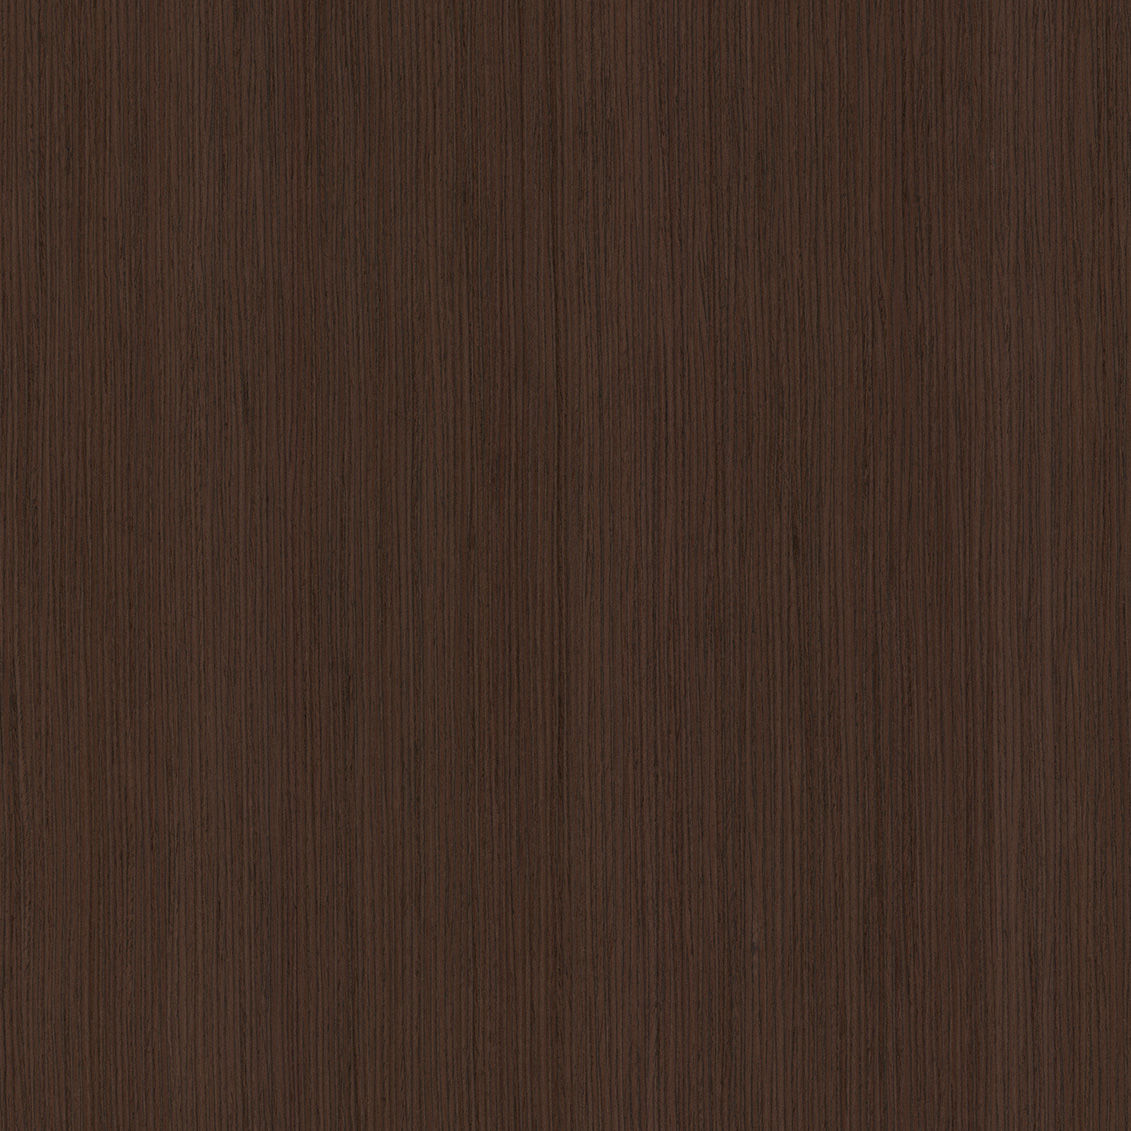 Wooden Veneer Dark Oak 10 67